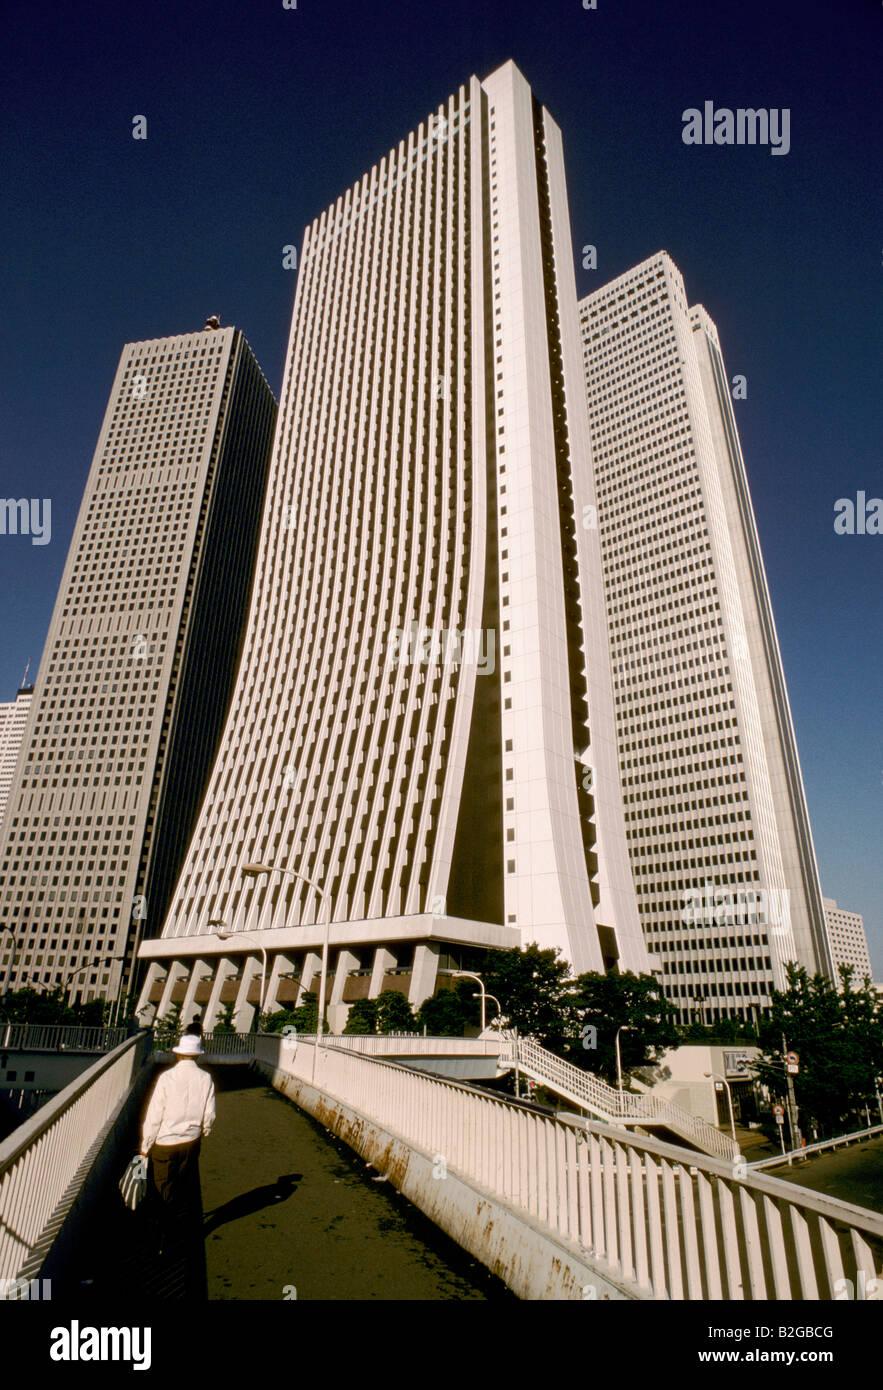 earthqake proof office blocks in shinjuku tokyo - Stock Image